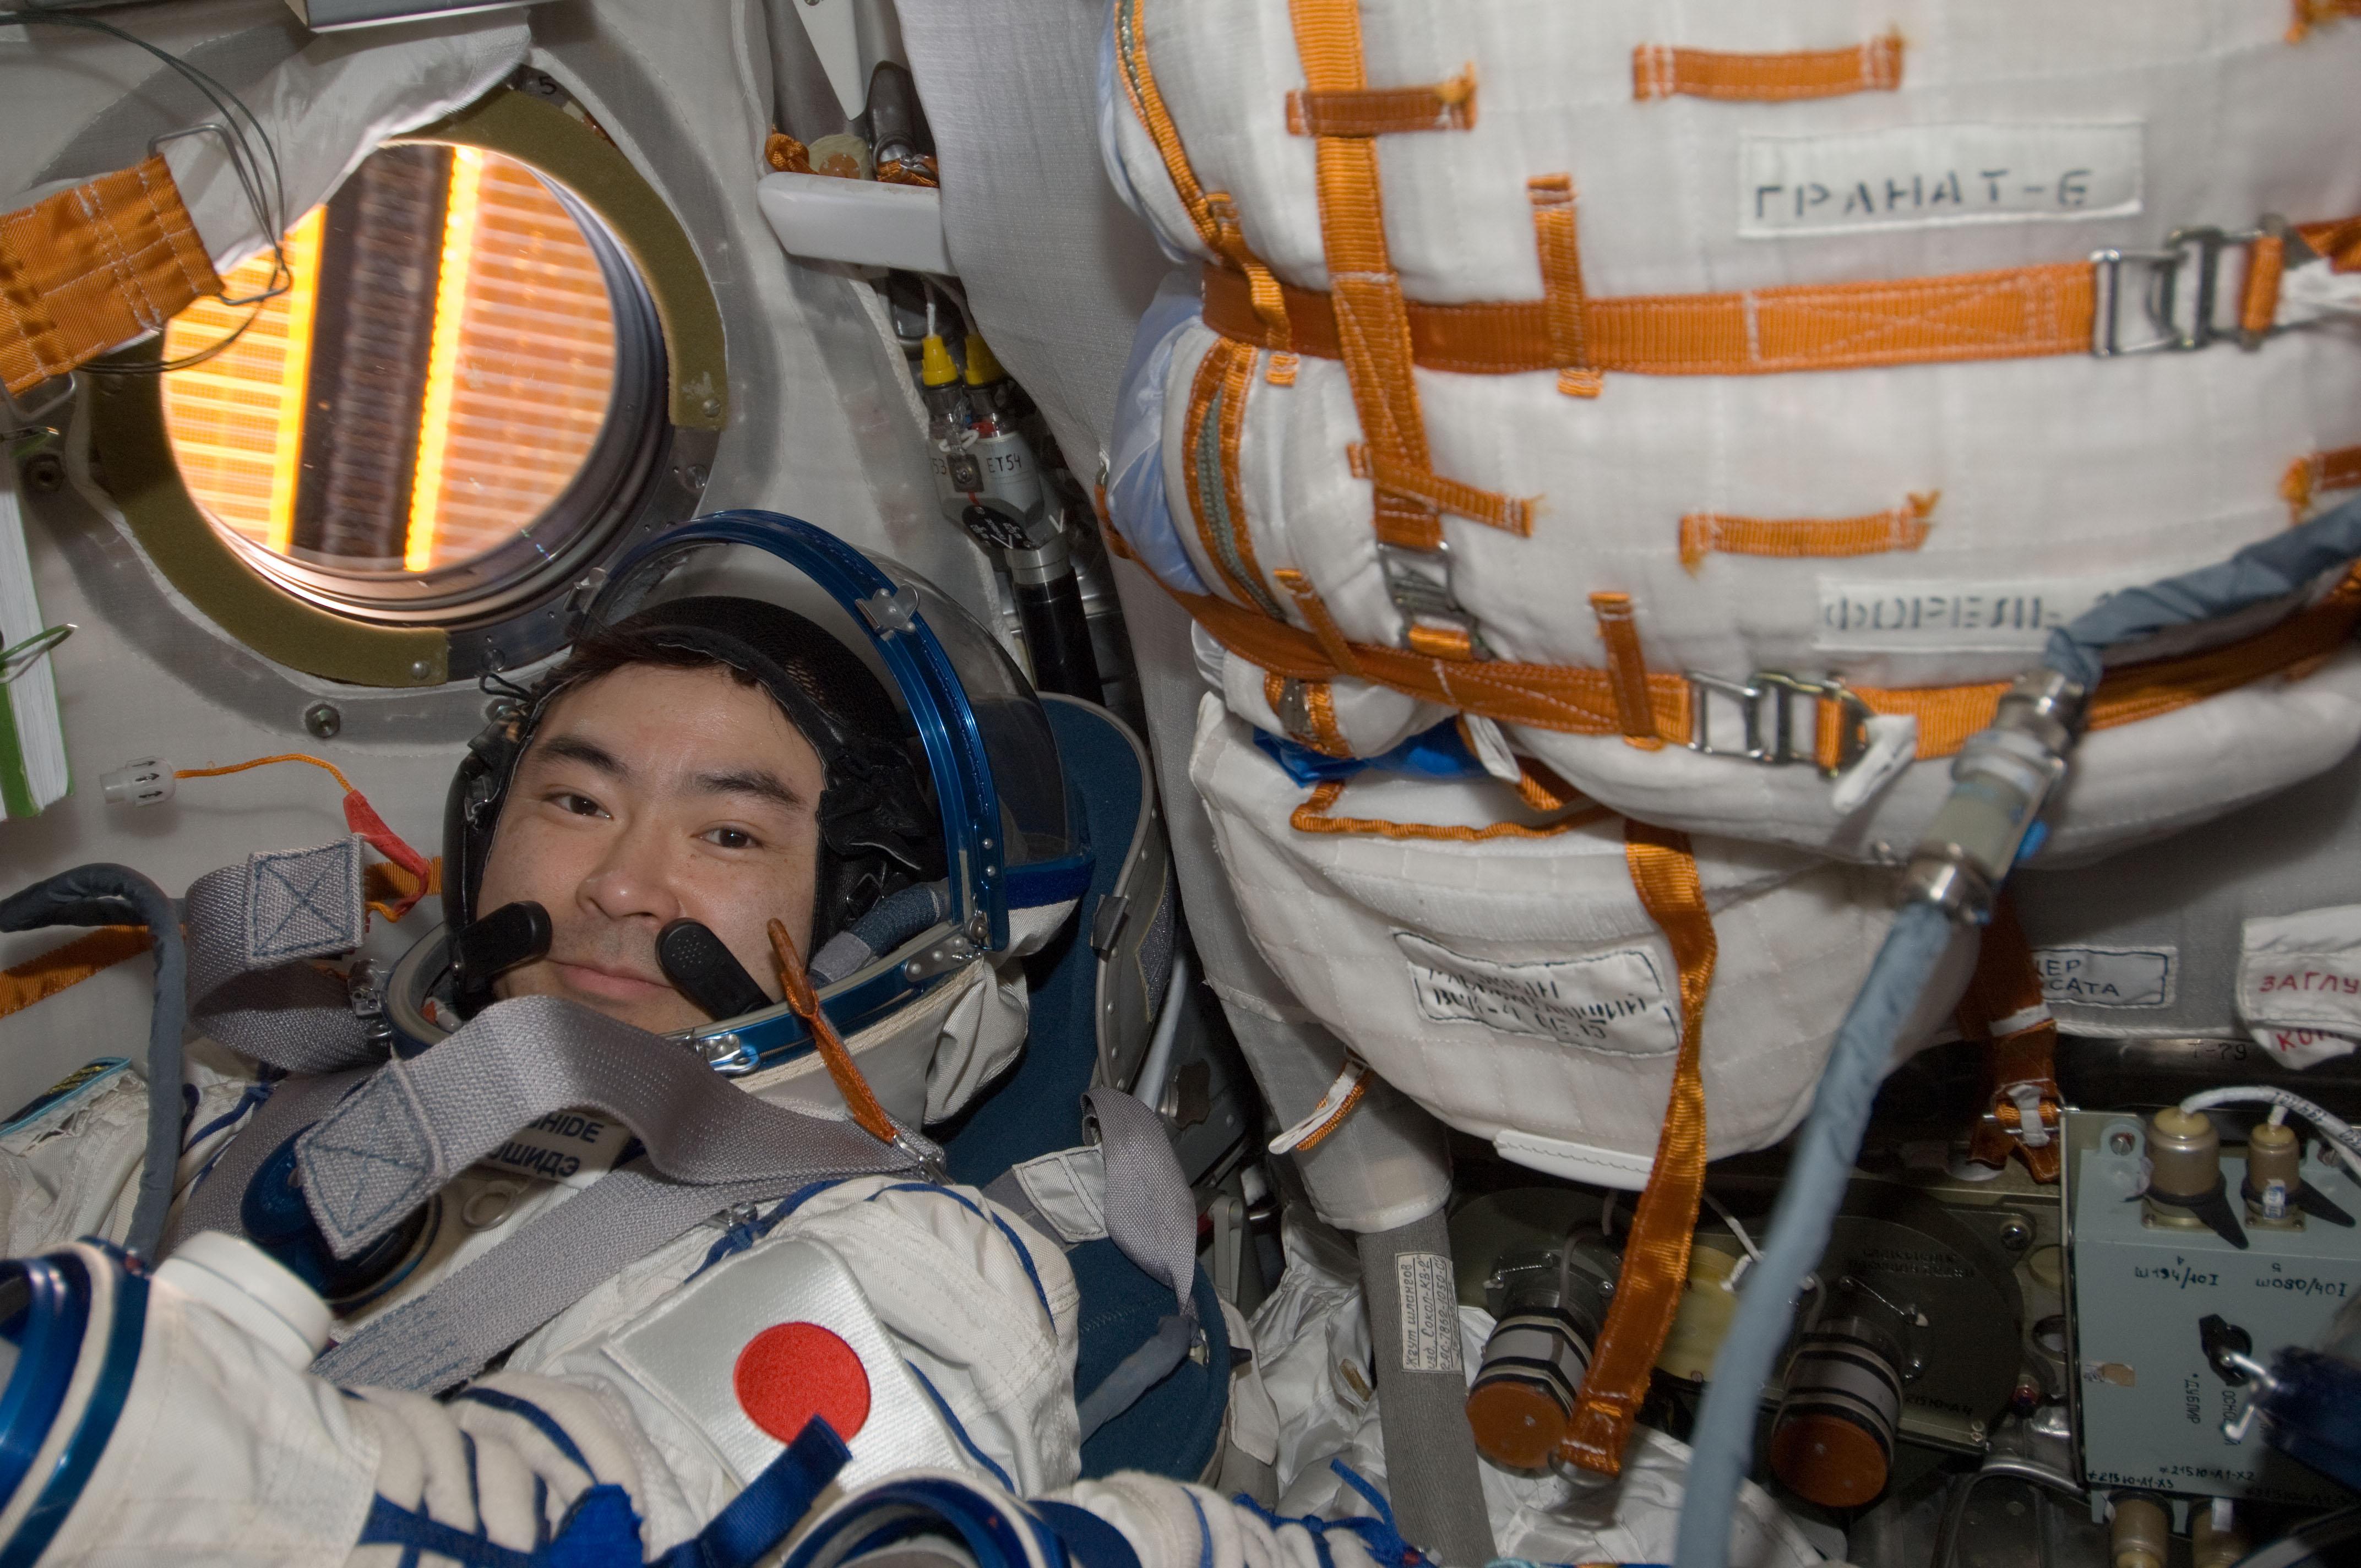 Expedition 33 Landing: Akihiko Hoshide